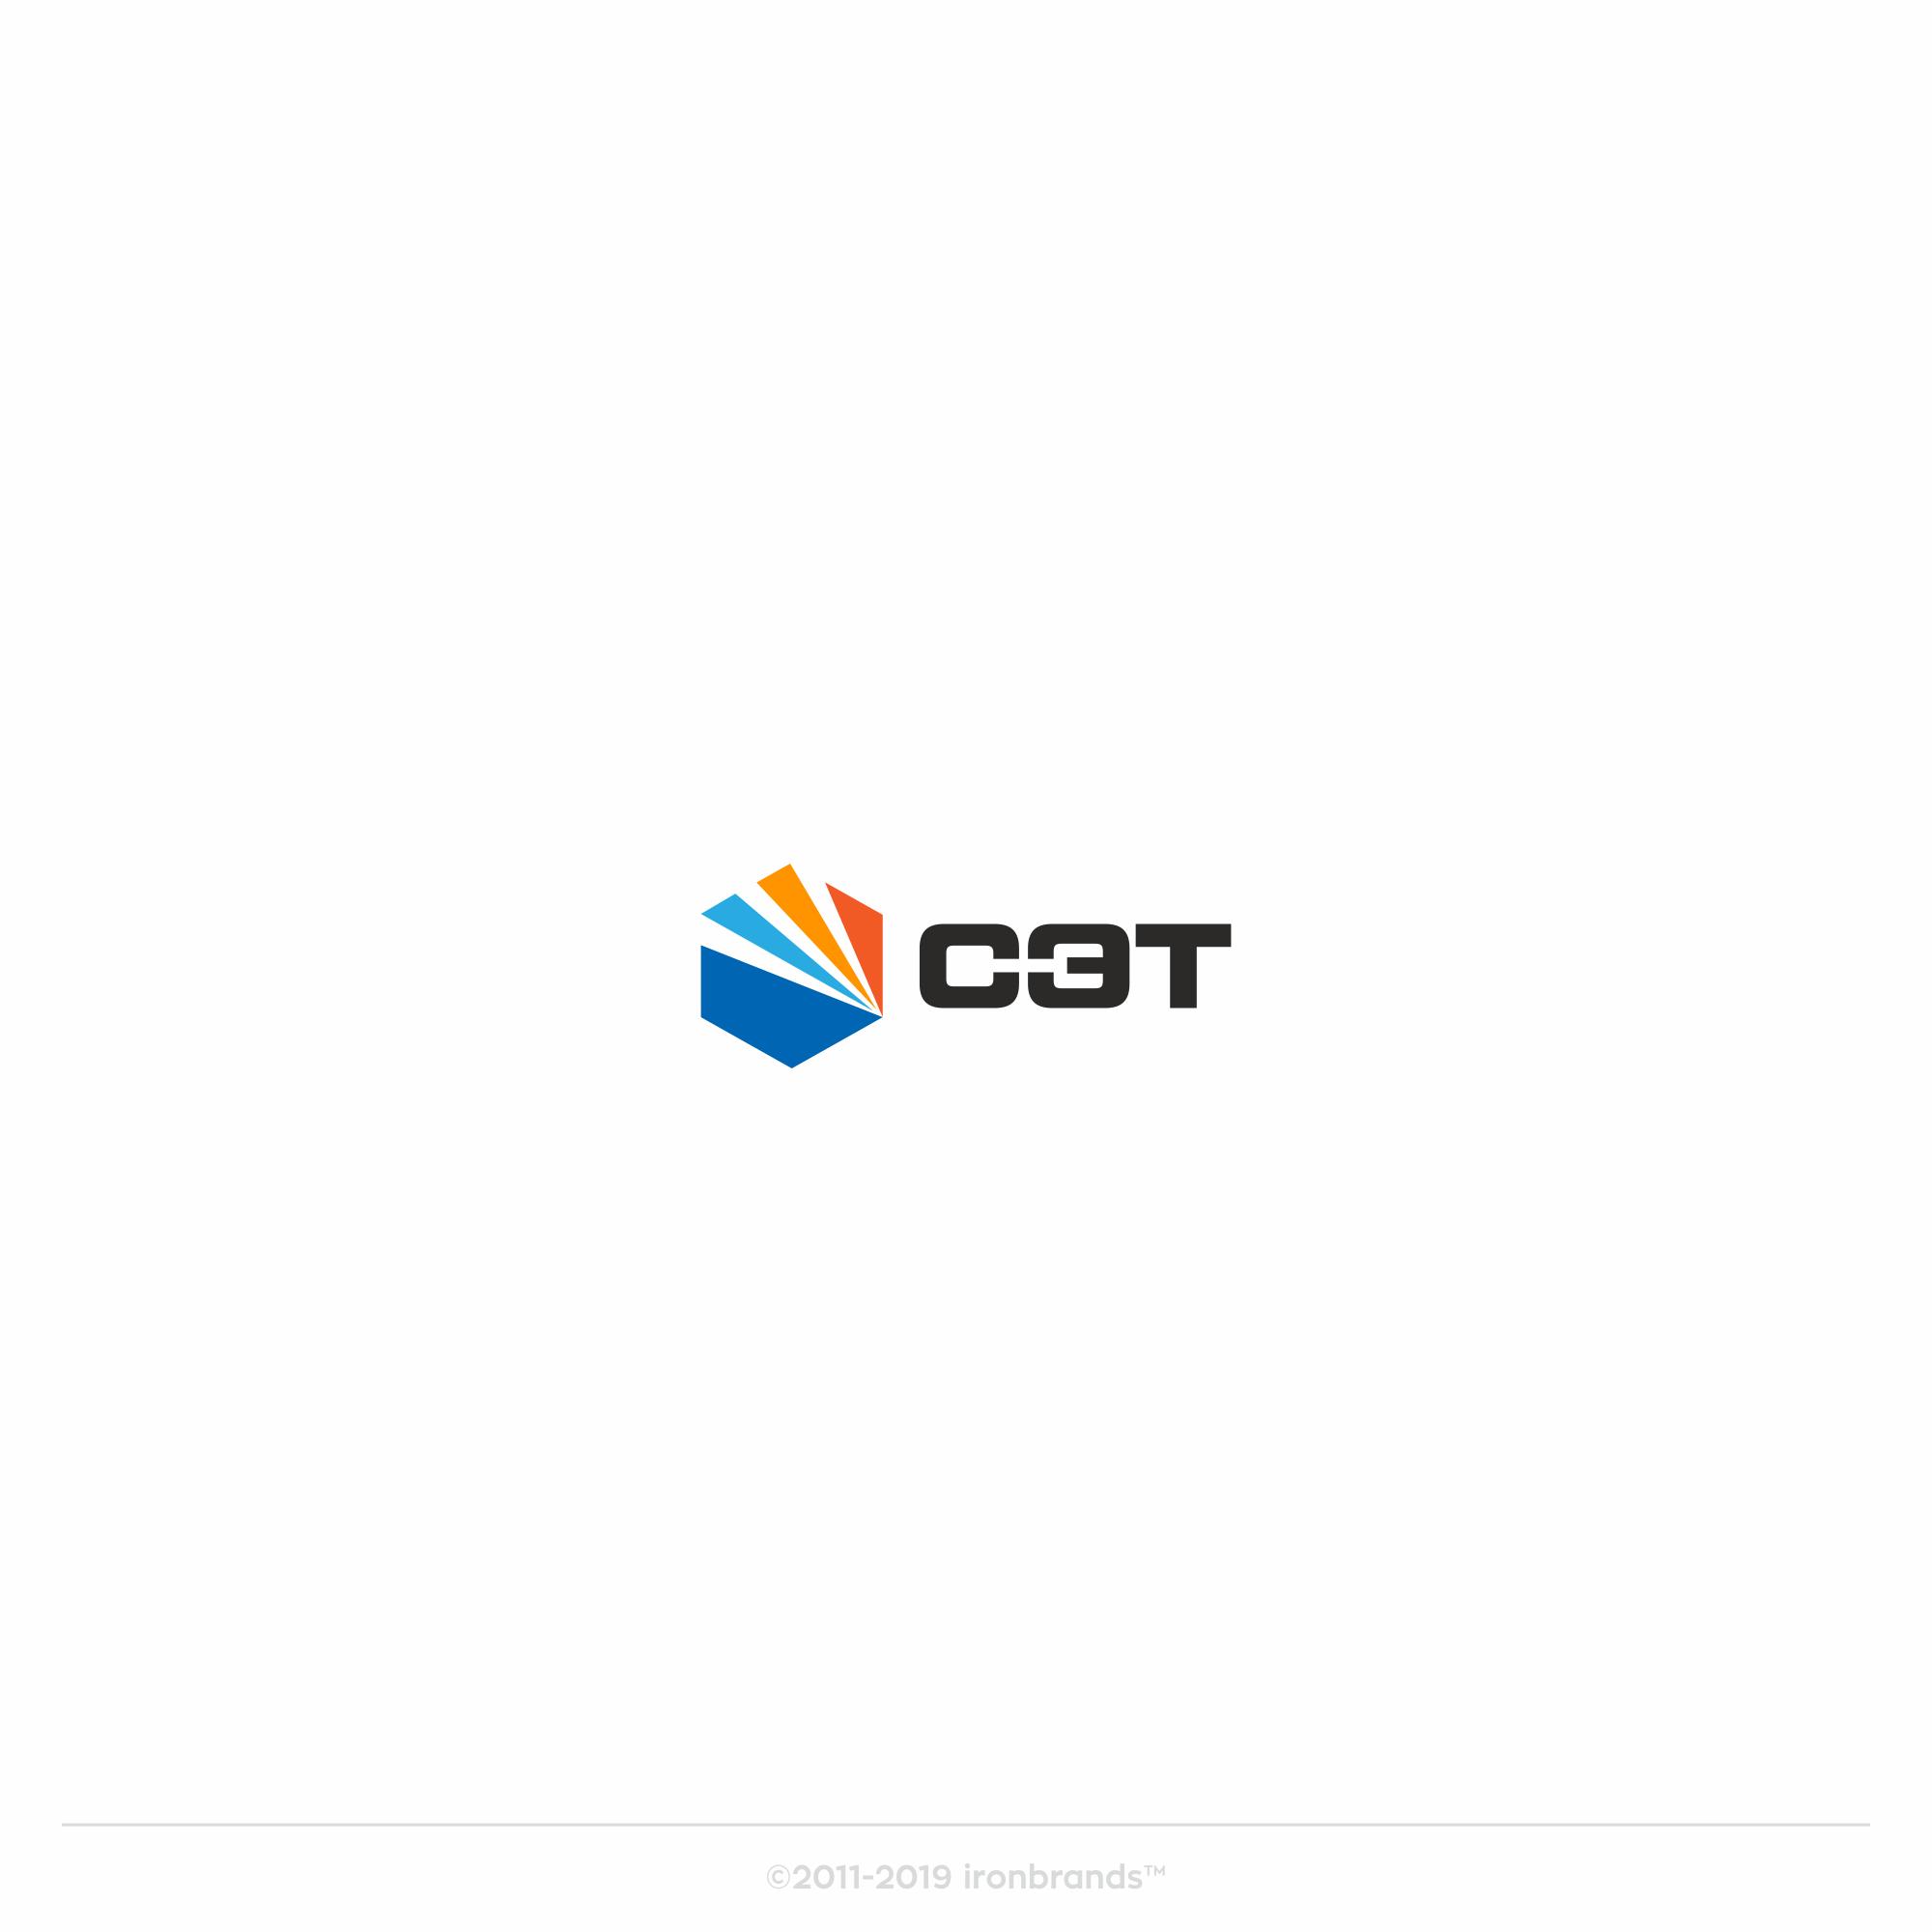 Срочно! Дизайн логотипа ООО «СЭТ» фото f_3975d530a0917338.jpg